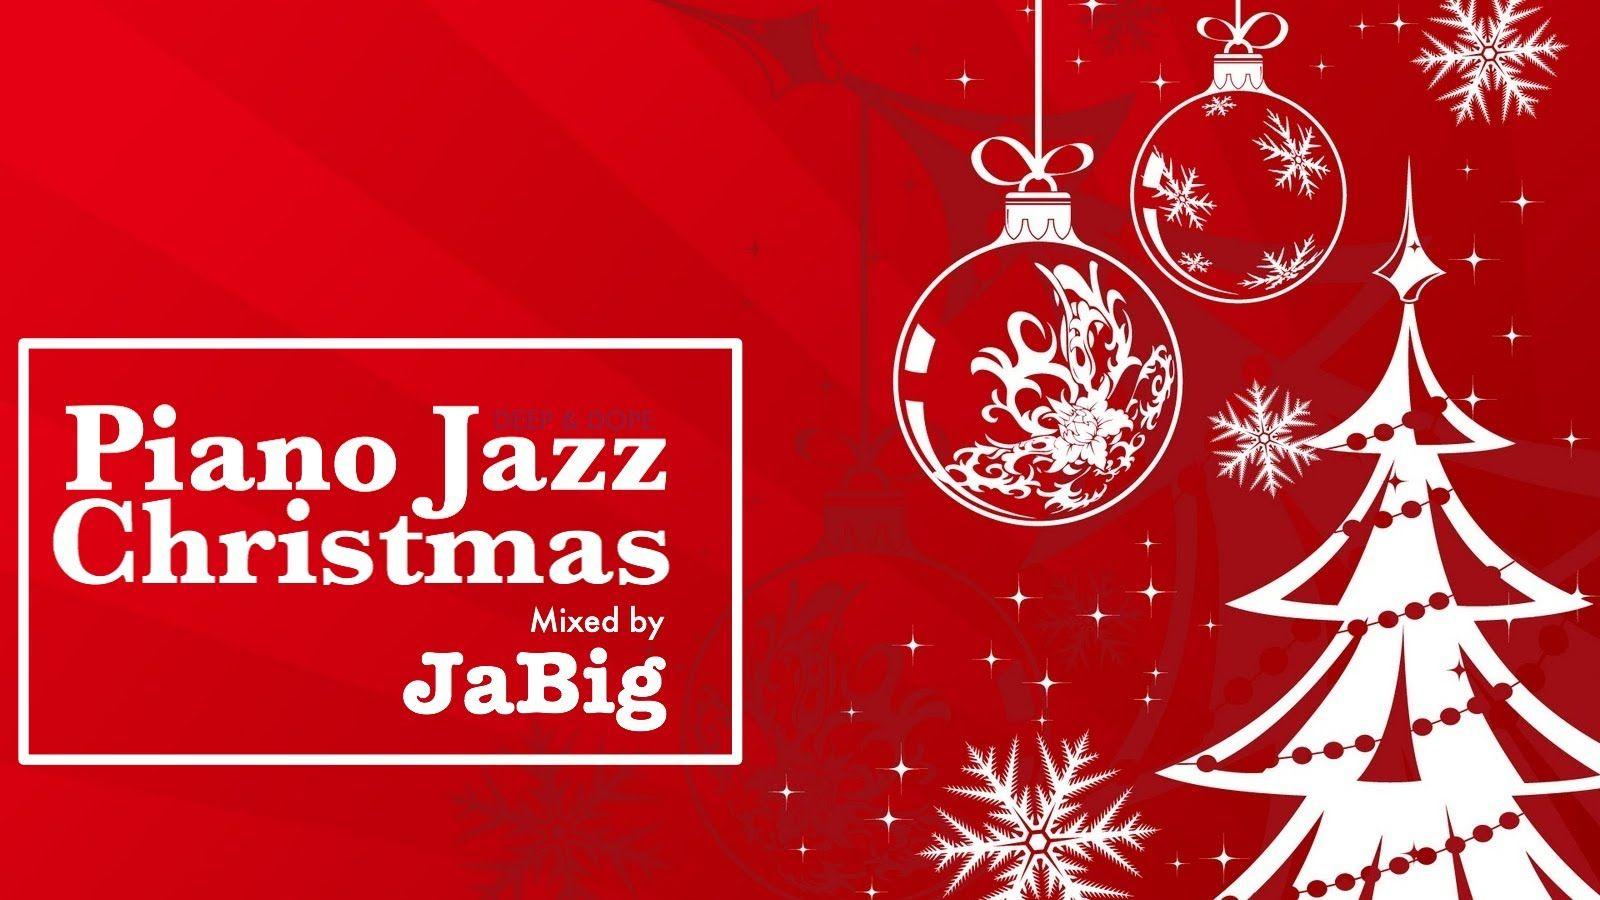 Christmas Music Mixes.3 Hour Piano Jazz Christmas Music Playlist Mix By Jabig